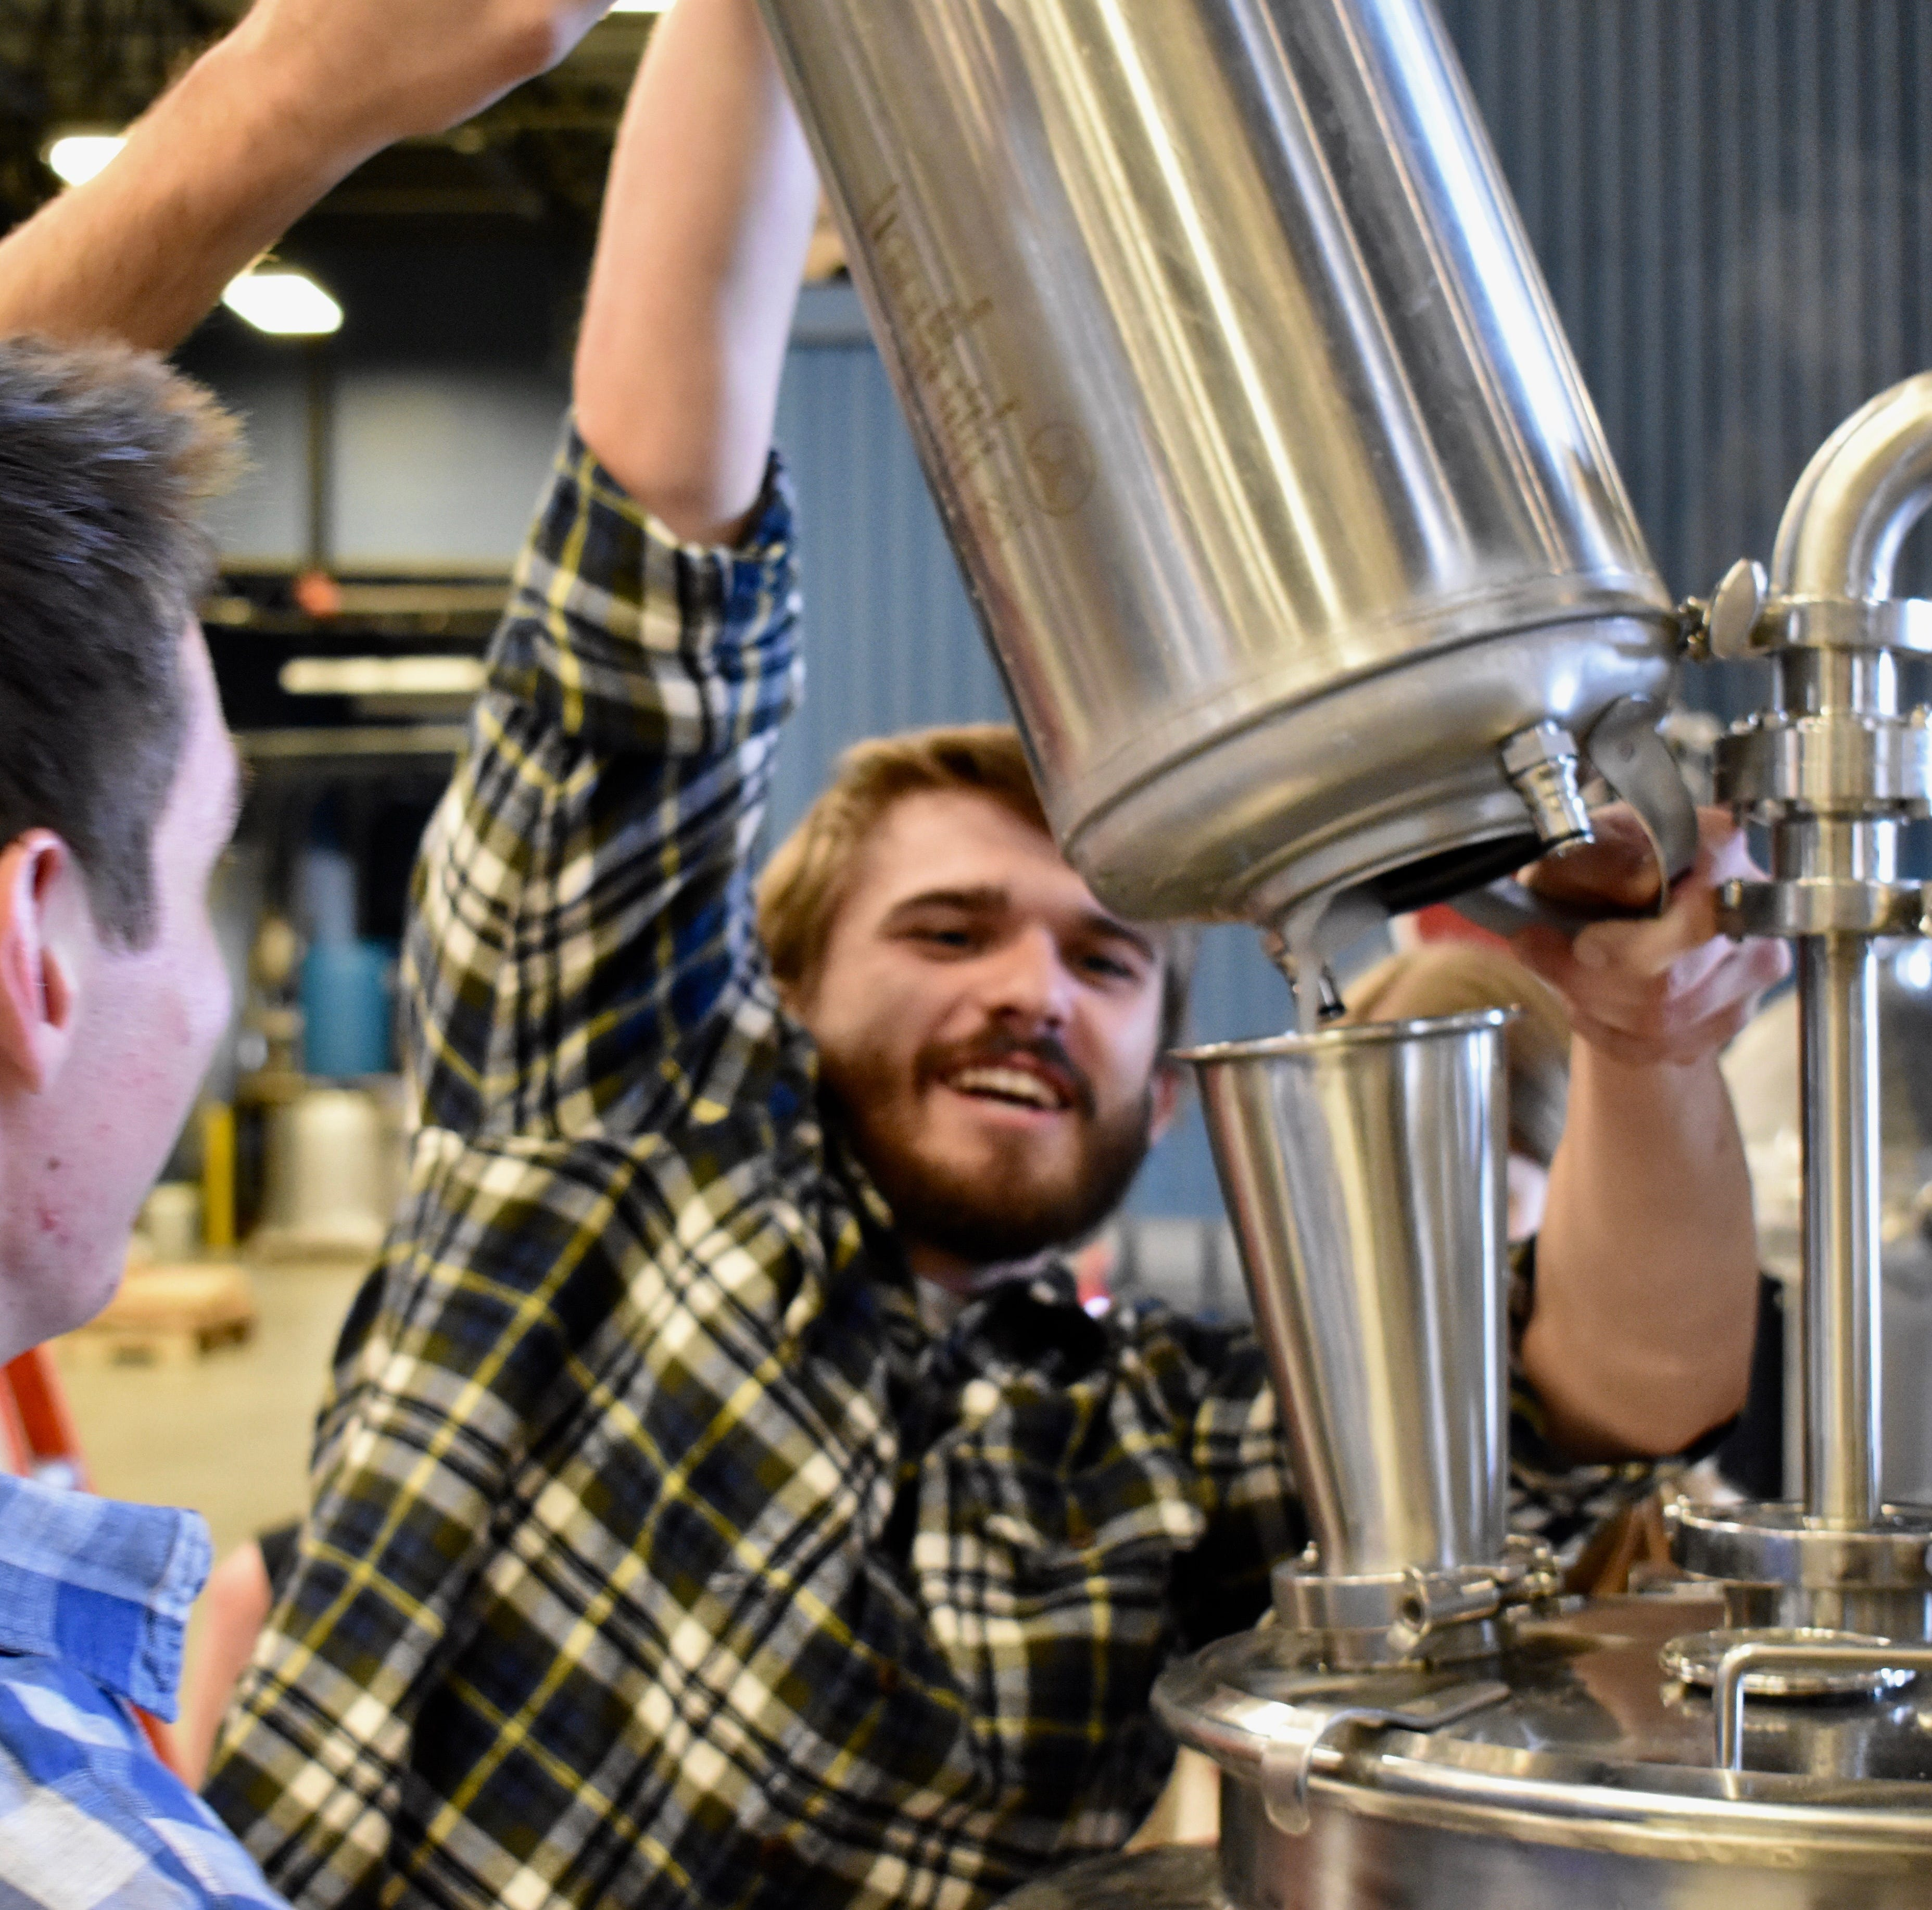 Sheboygan site of rare wild yeast used in new Wisconsin Wild Lager beer